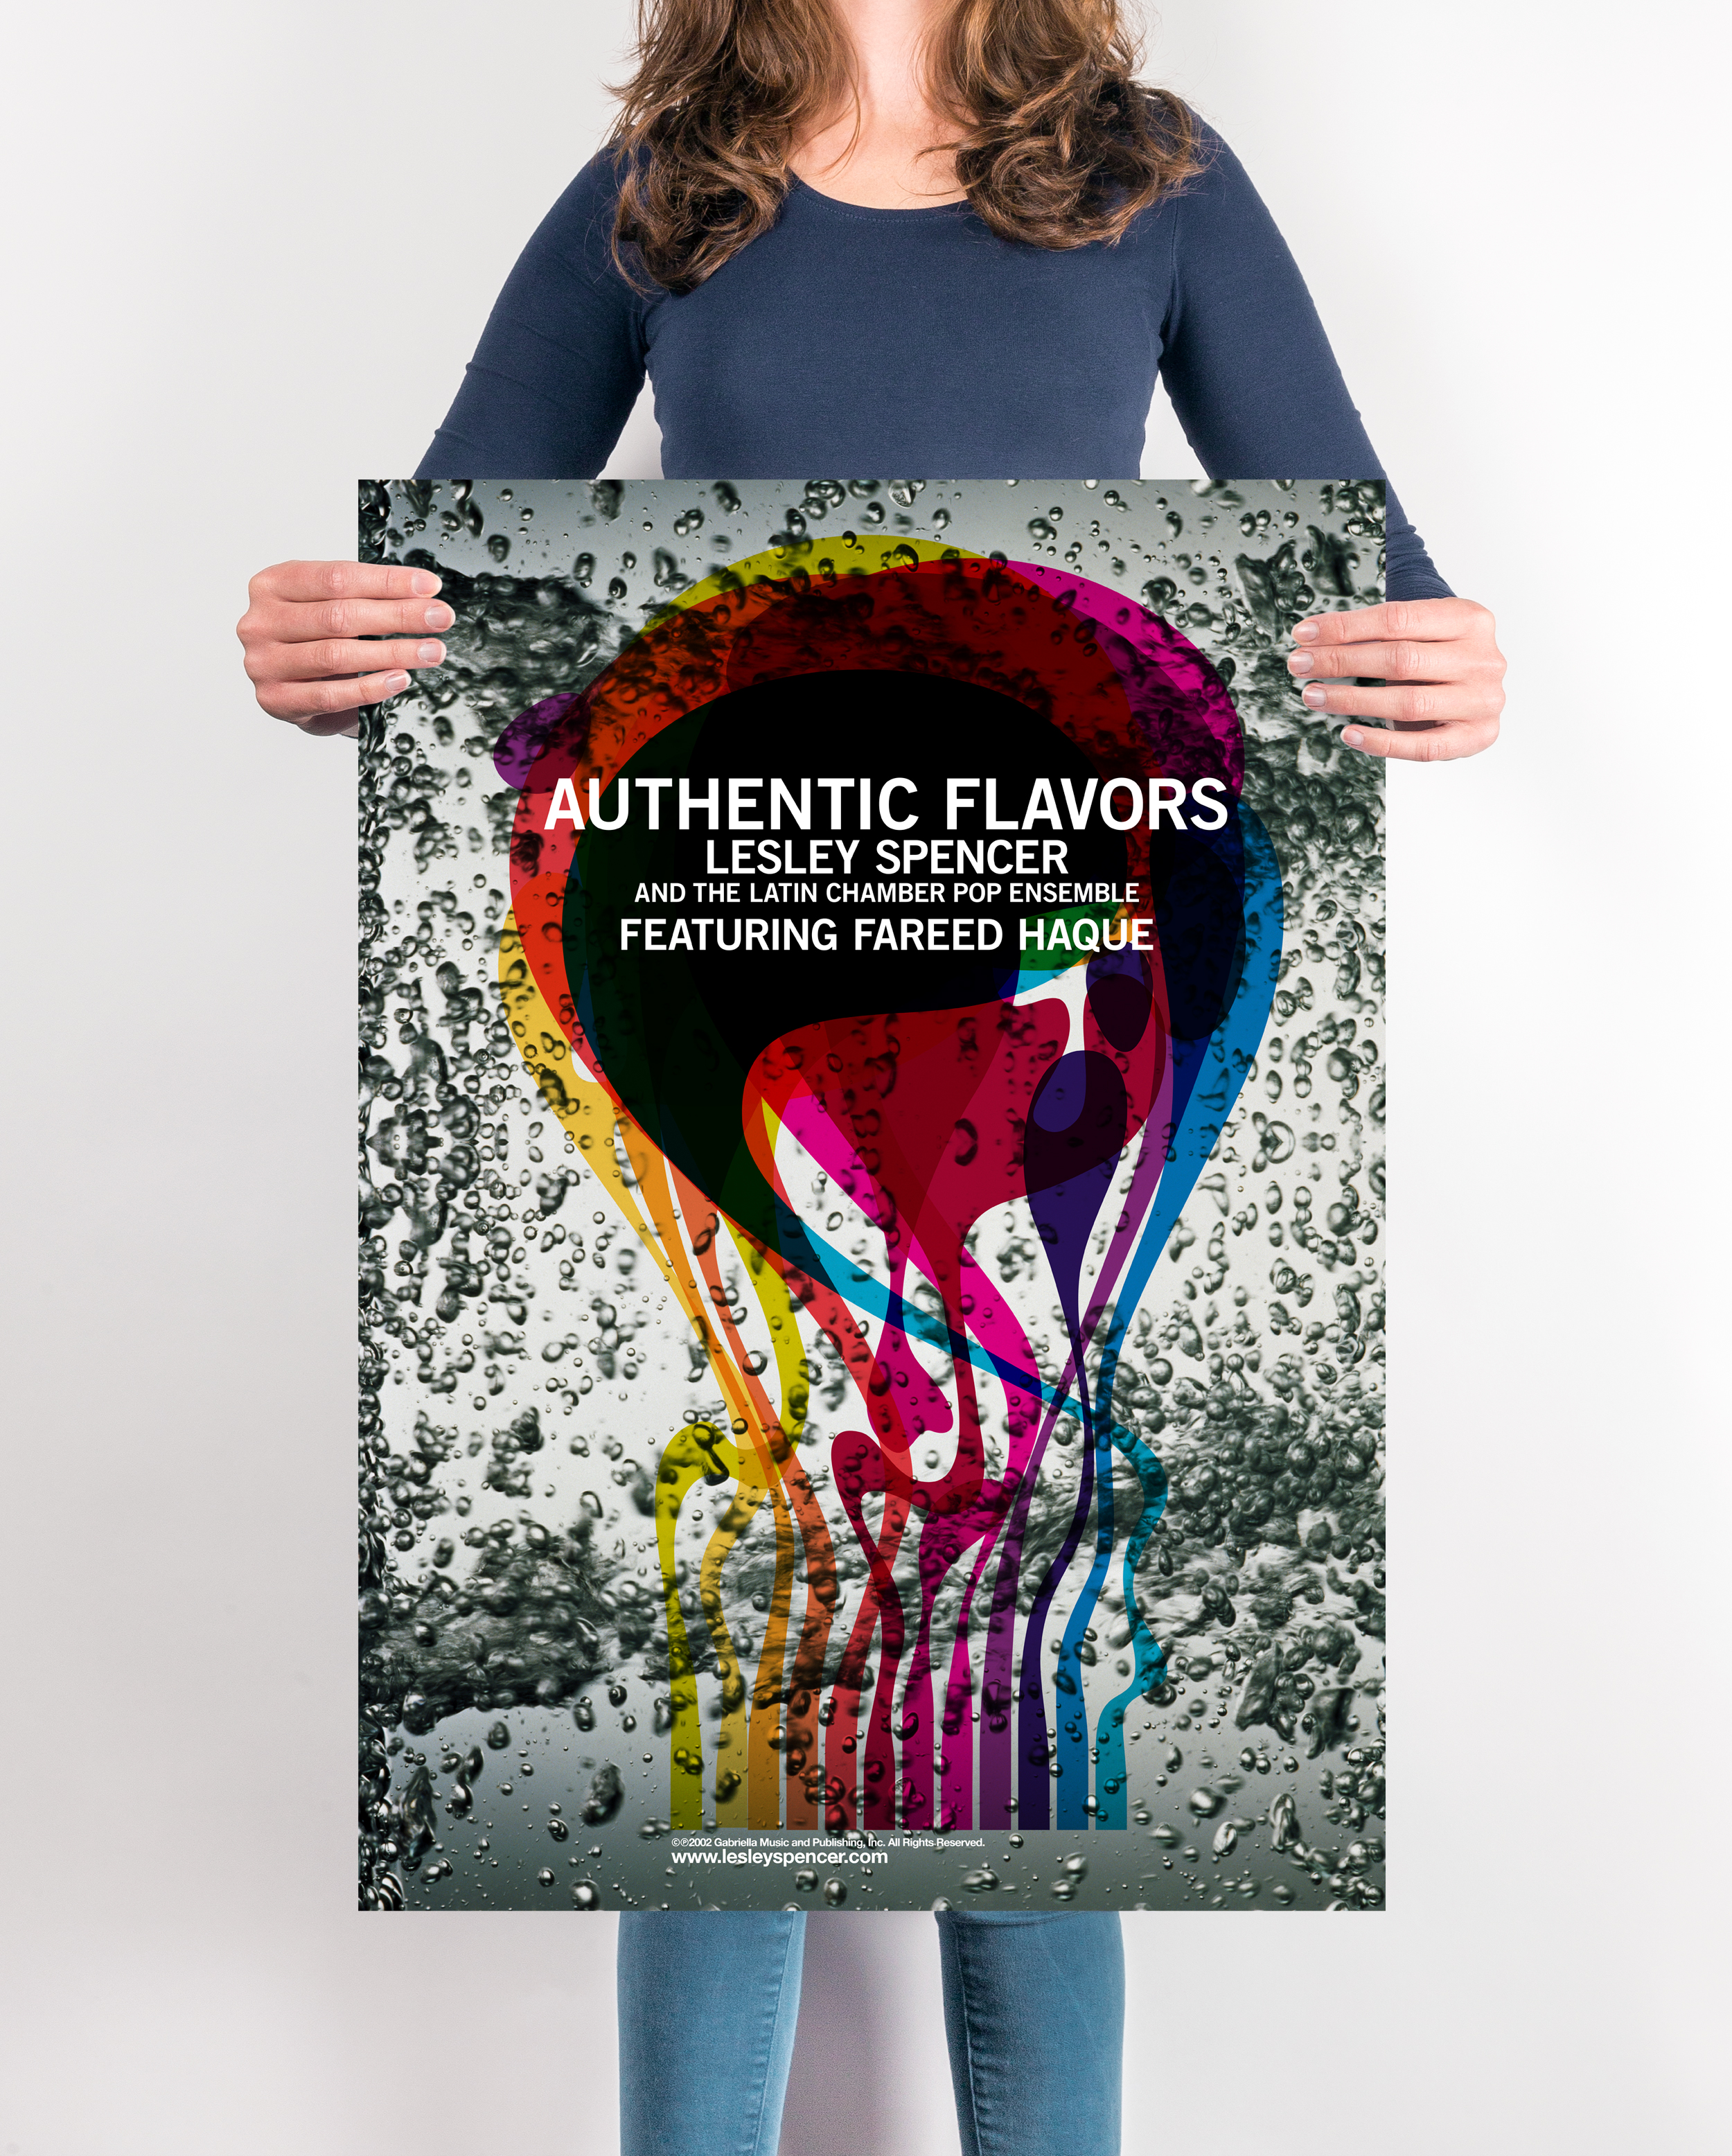 3D_lesley-spencer_authentic-flav_poster_2500w.jpg